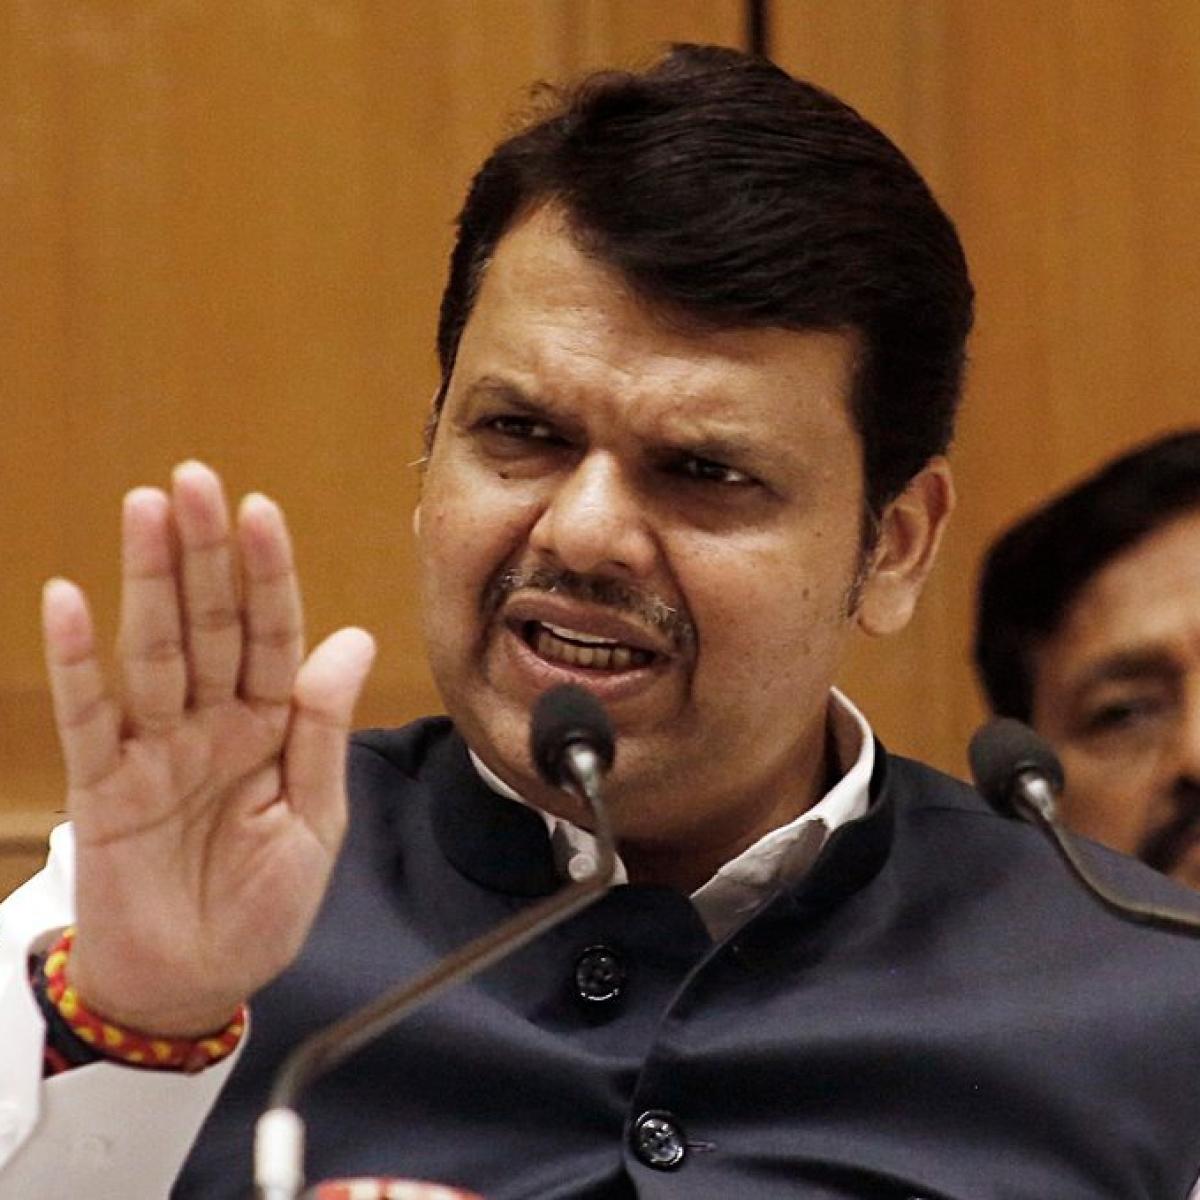 NCP leaders ridicule Maharashtra government, CM over pending water bills